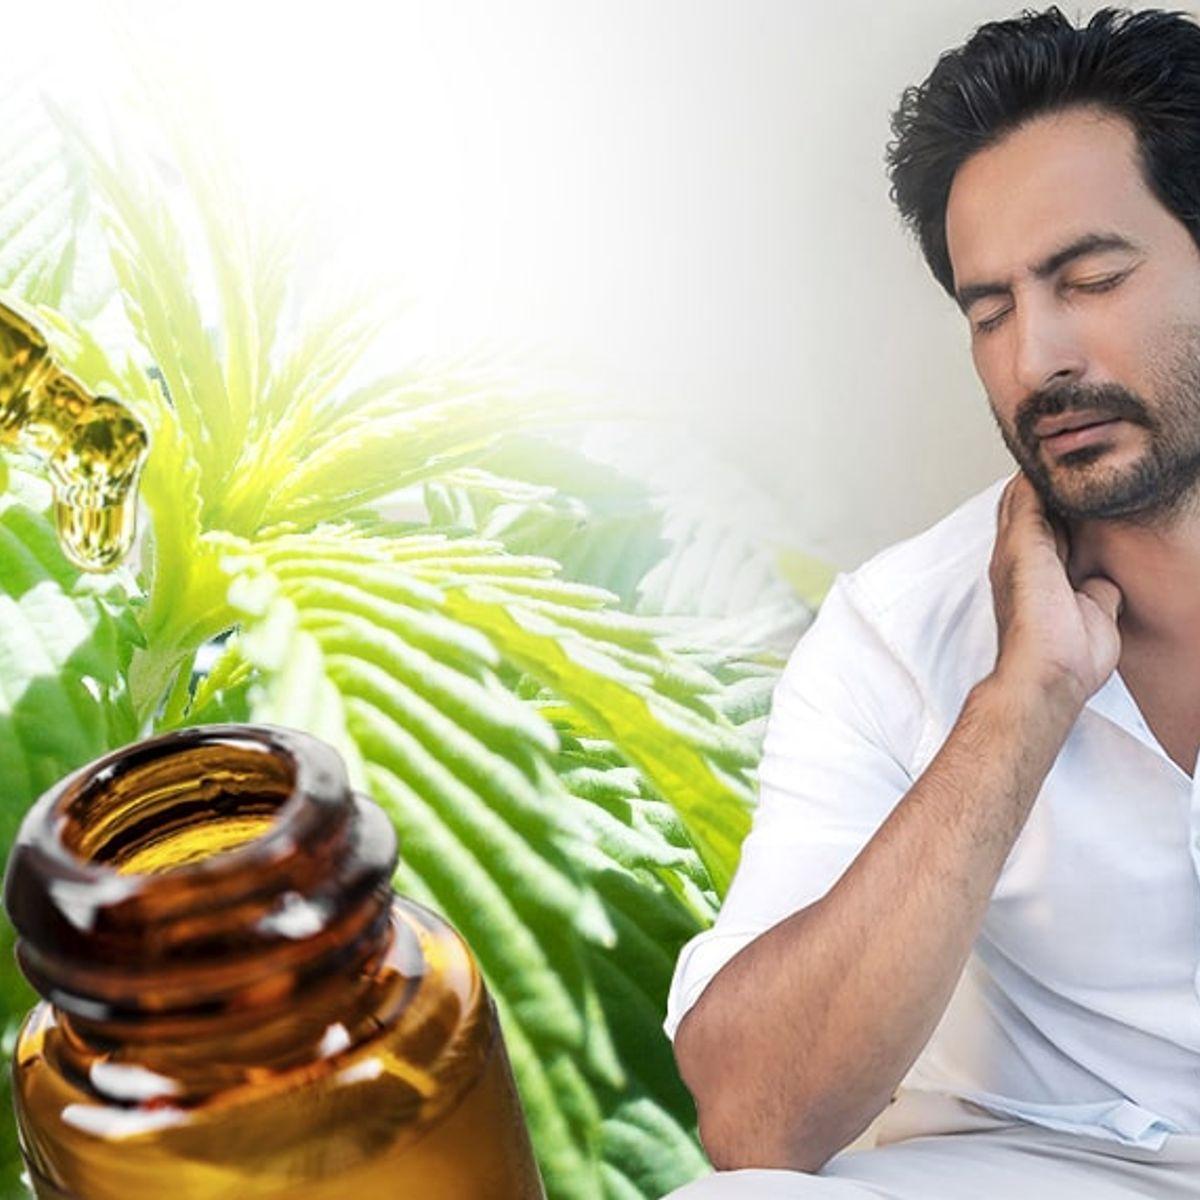 Does CBD Work for Pain Relief? | Salon.com